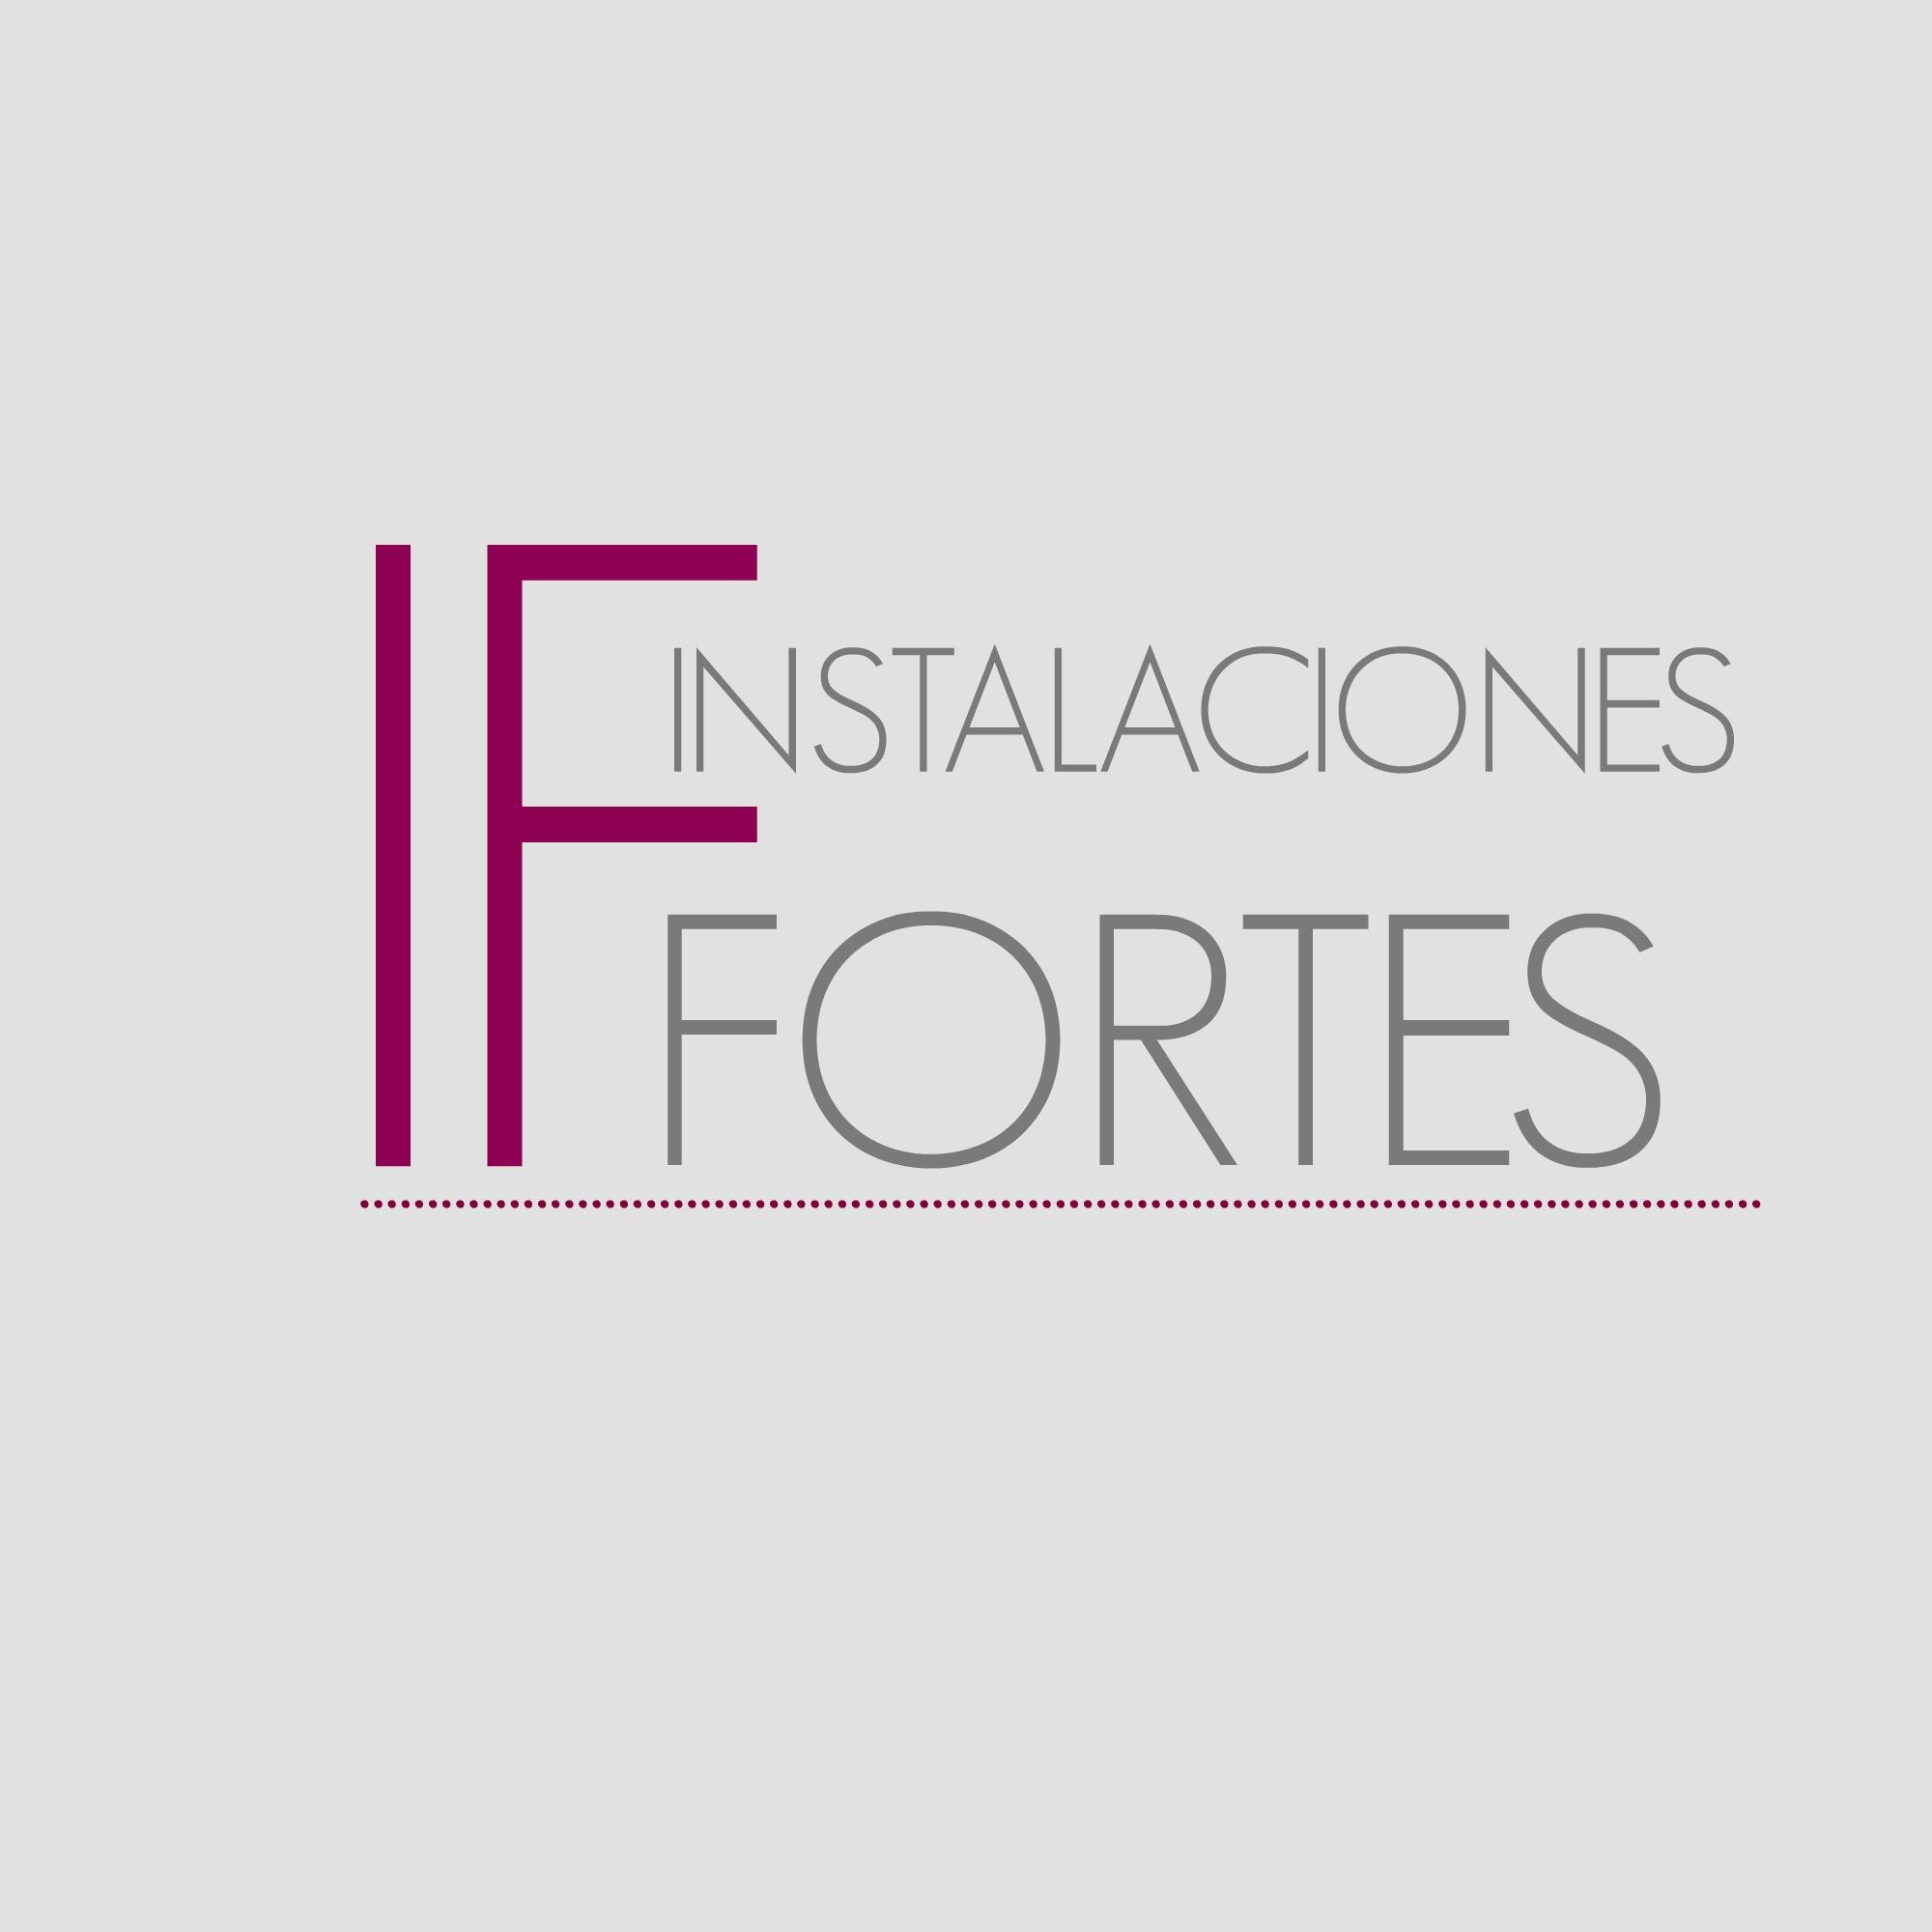 Instalaciones Fortes S.L.